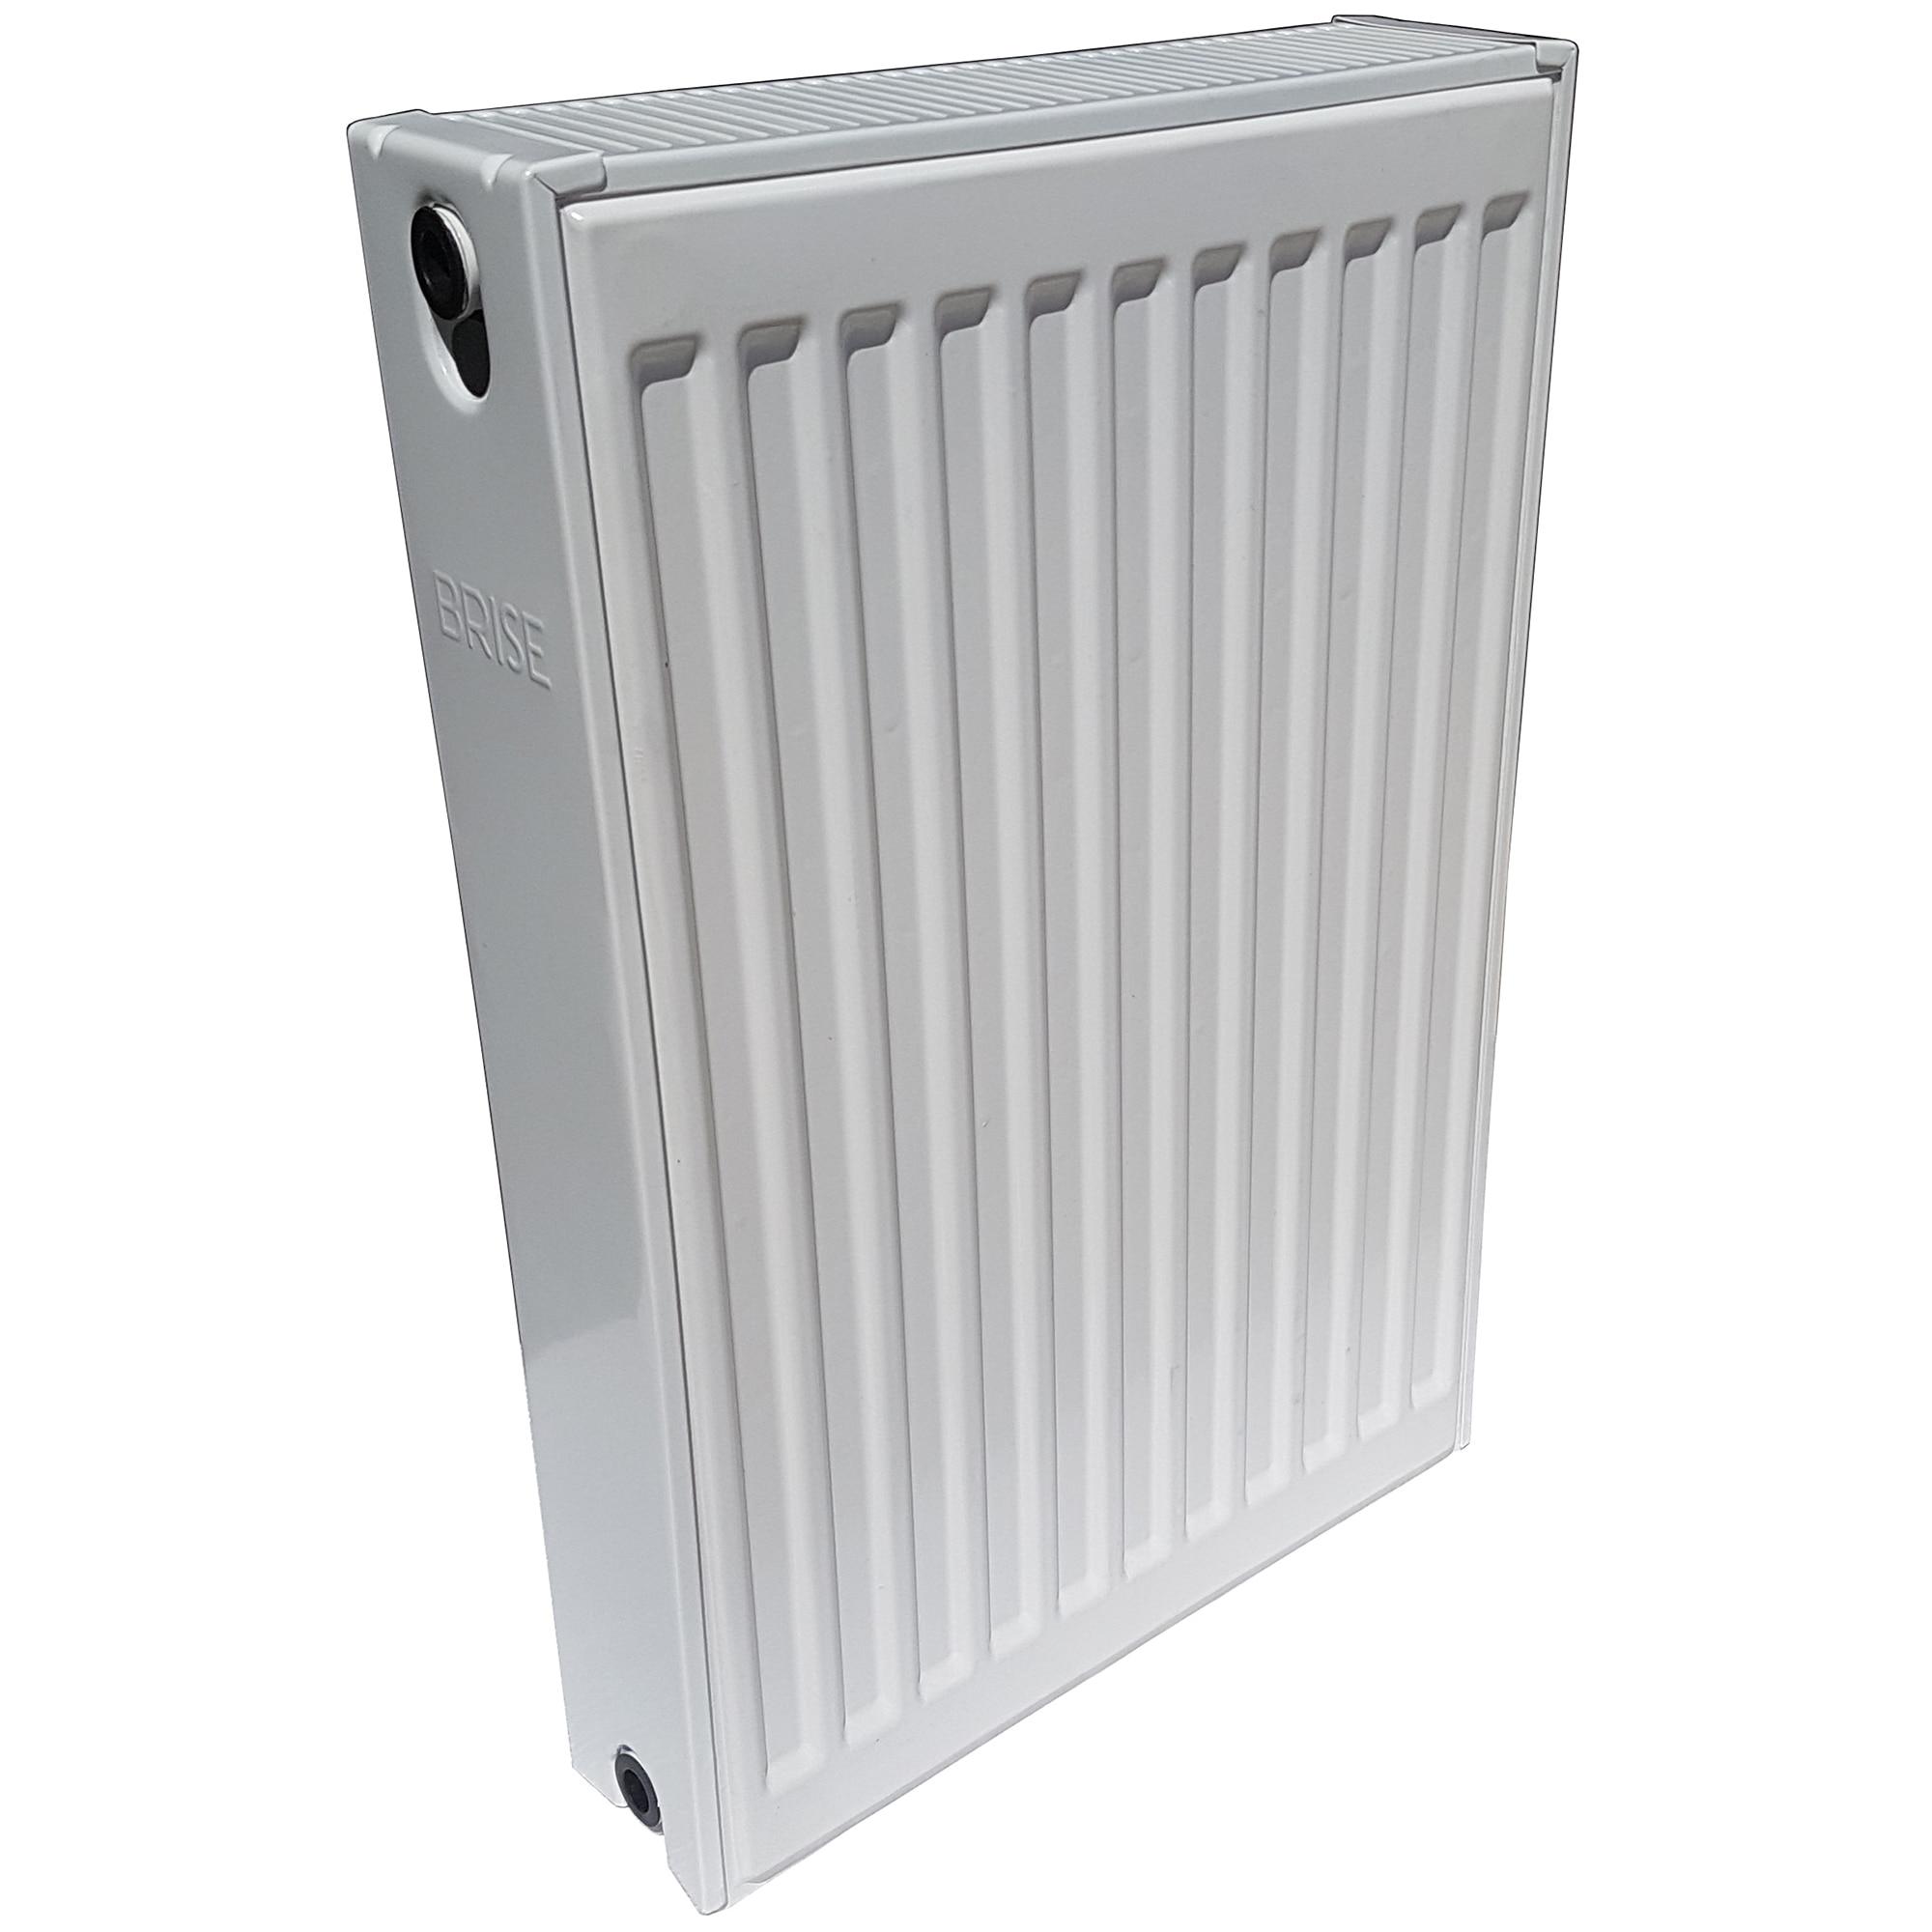 Fotografie Radiator otel (calorifer) Brise Heizkorper, tip 22, 600X600 mm, alb